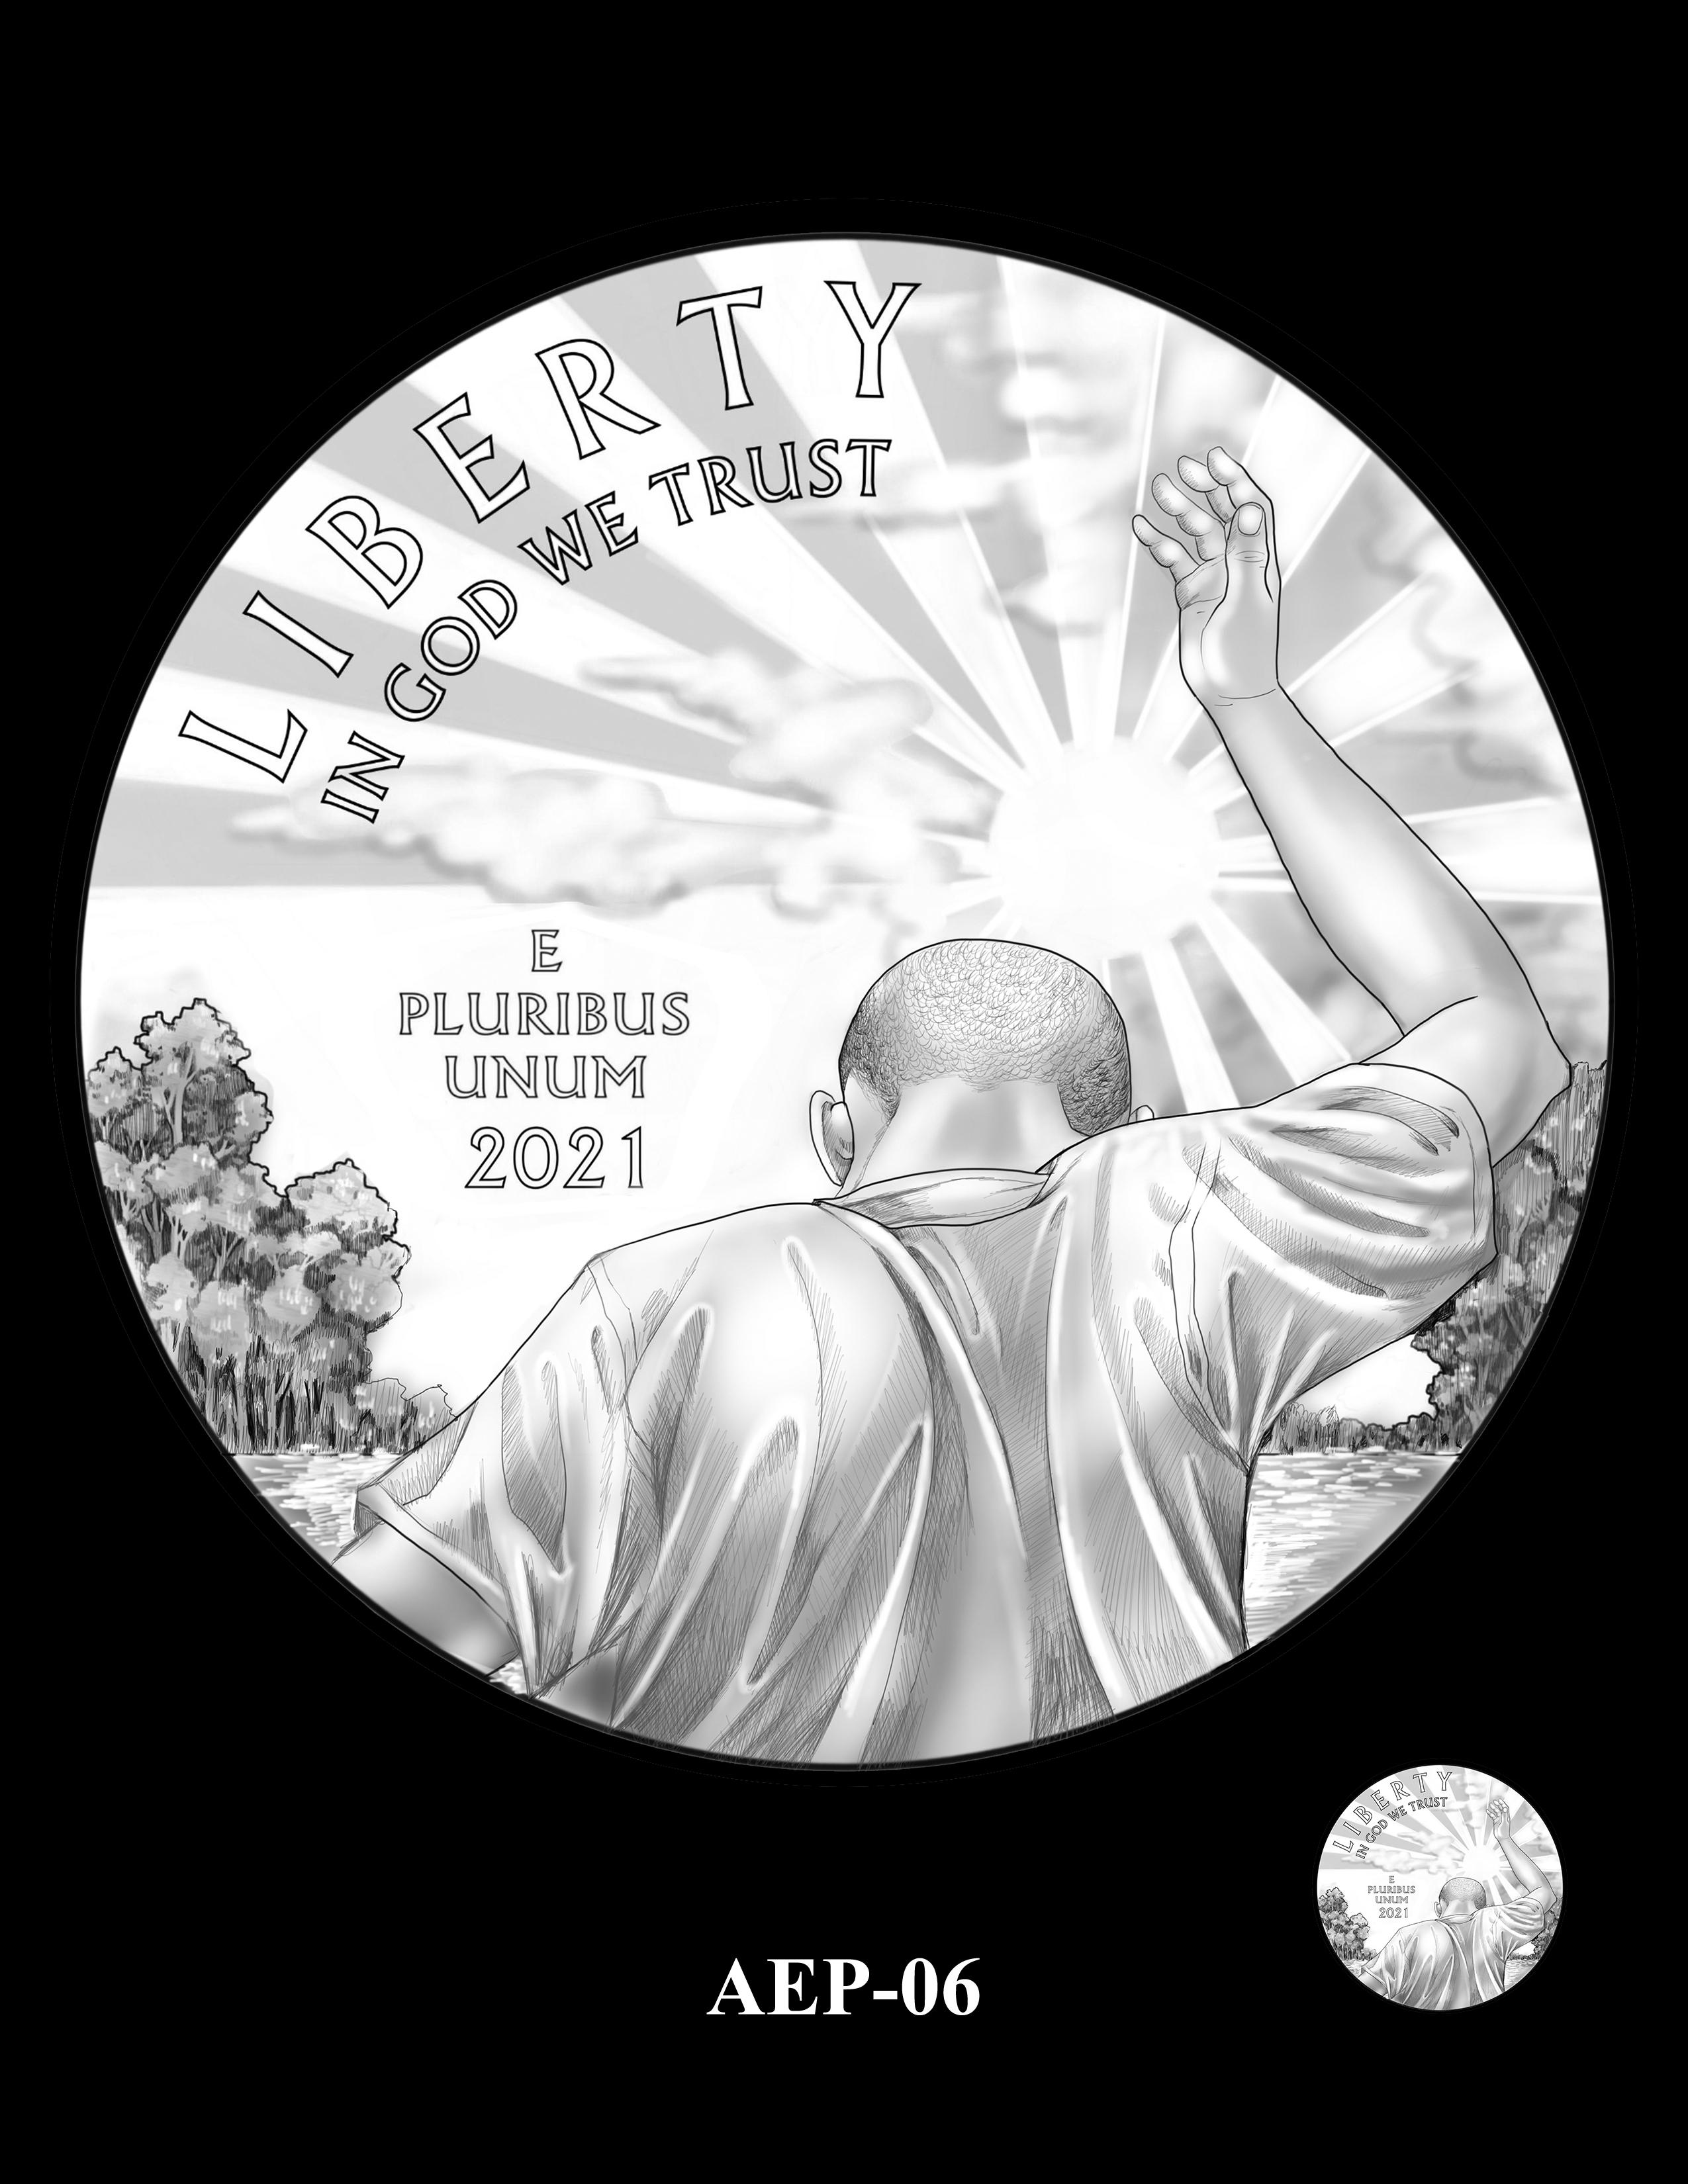 AEP-06 -- 2021 American Eagle Platinum Proof Program